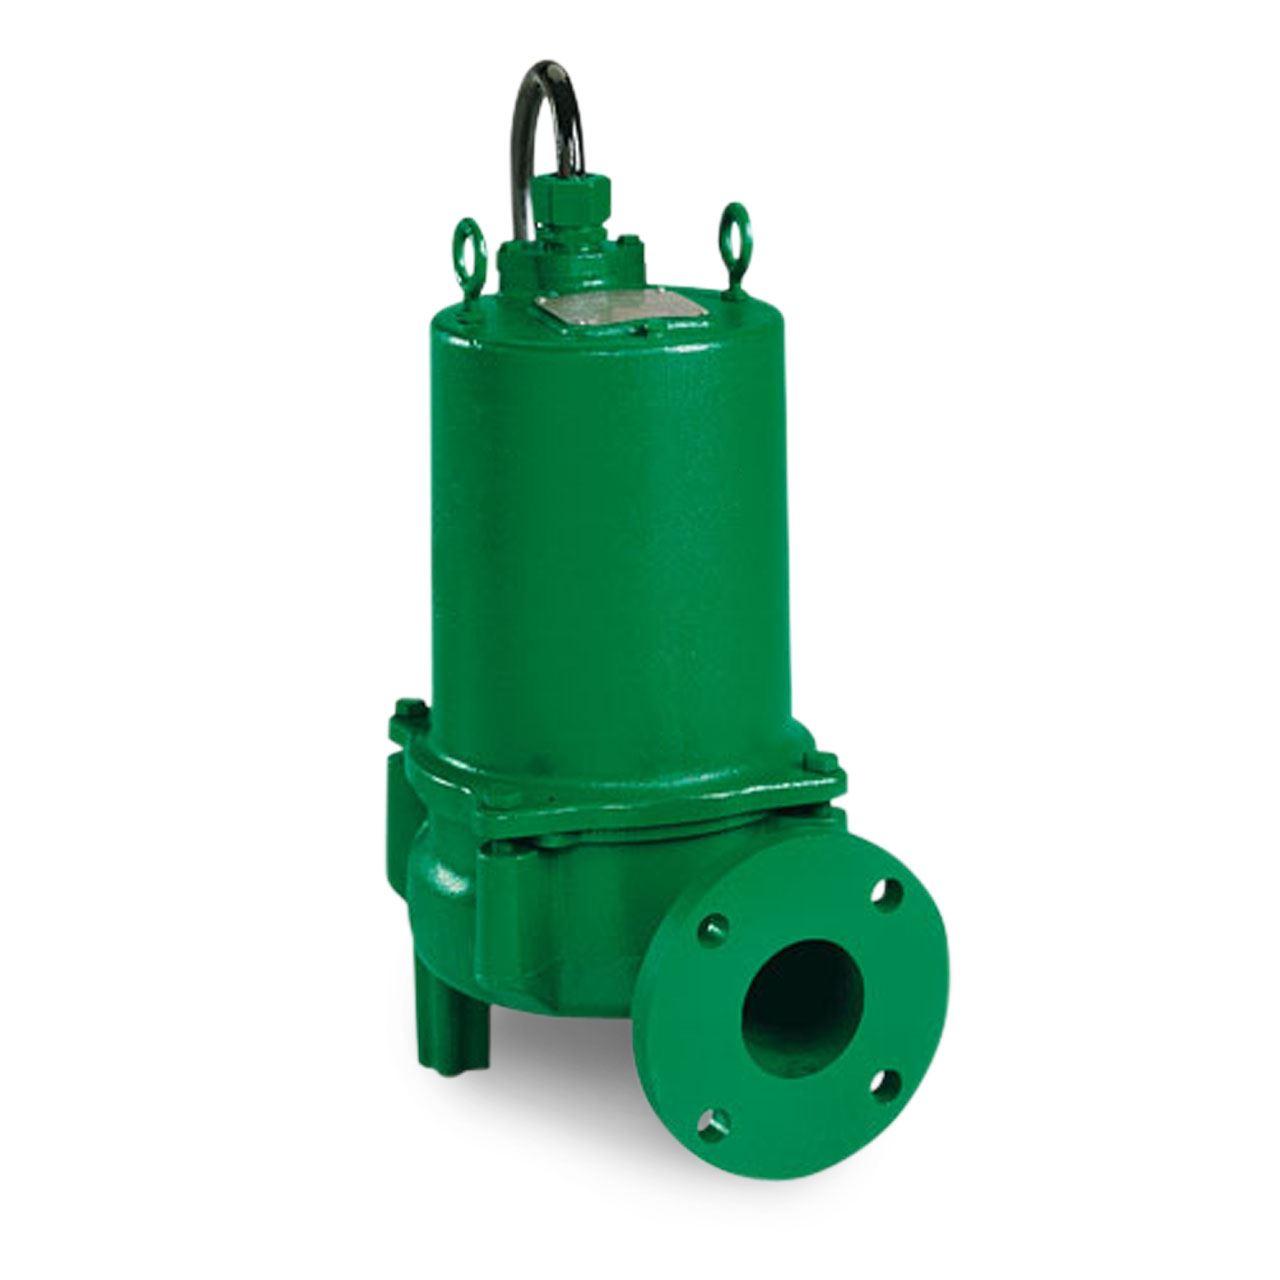 myers myers ms3s200m4 4 submersible sewage pump 2 0 hp 460v 3ph rh rcworst com 220 Well Pump Wiring Diagram Well Pump Wiring Diagram